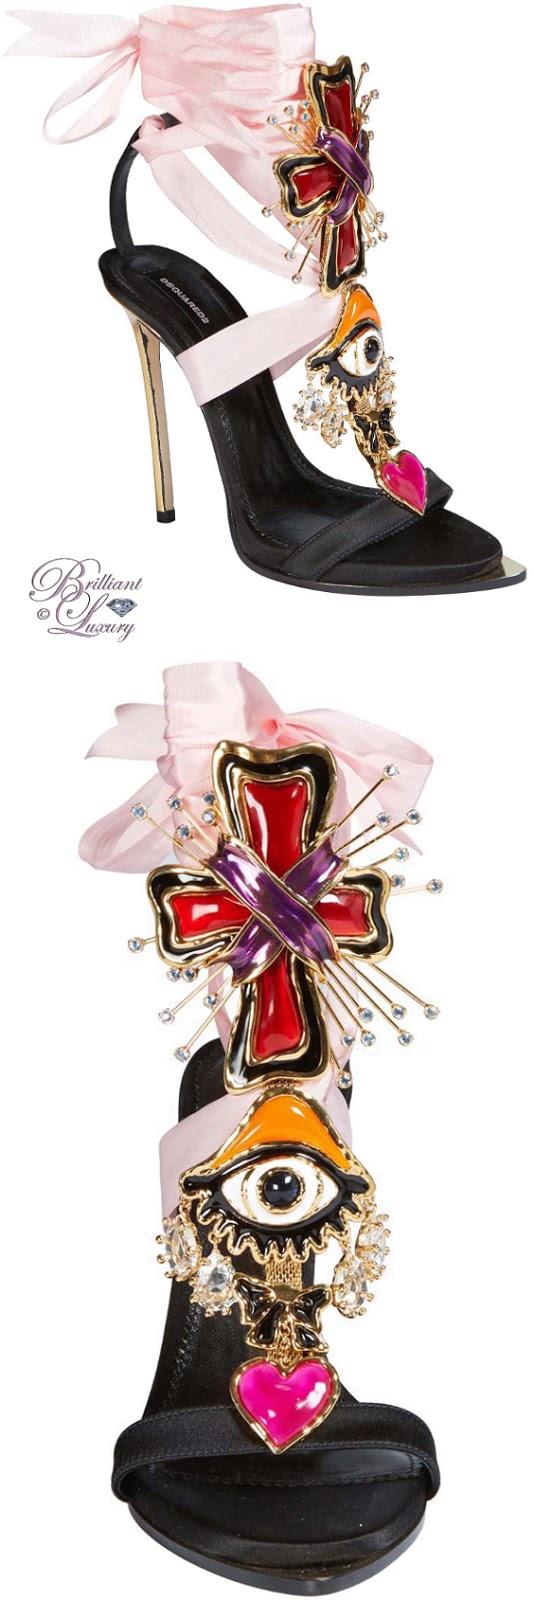 Brilliant Luxuruy ♦ Dsquared2 Lace-up Embellished Satin Sandals